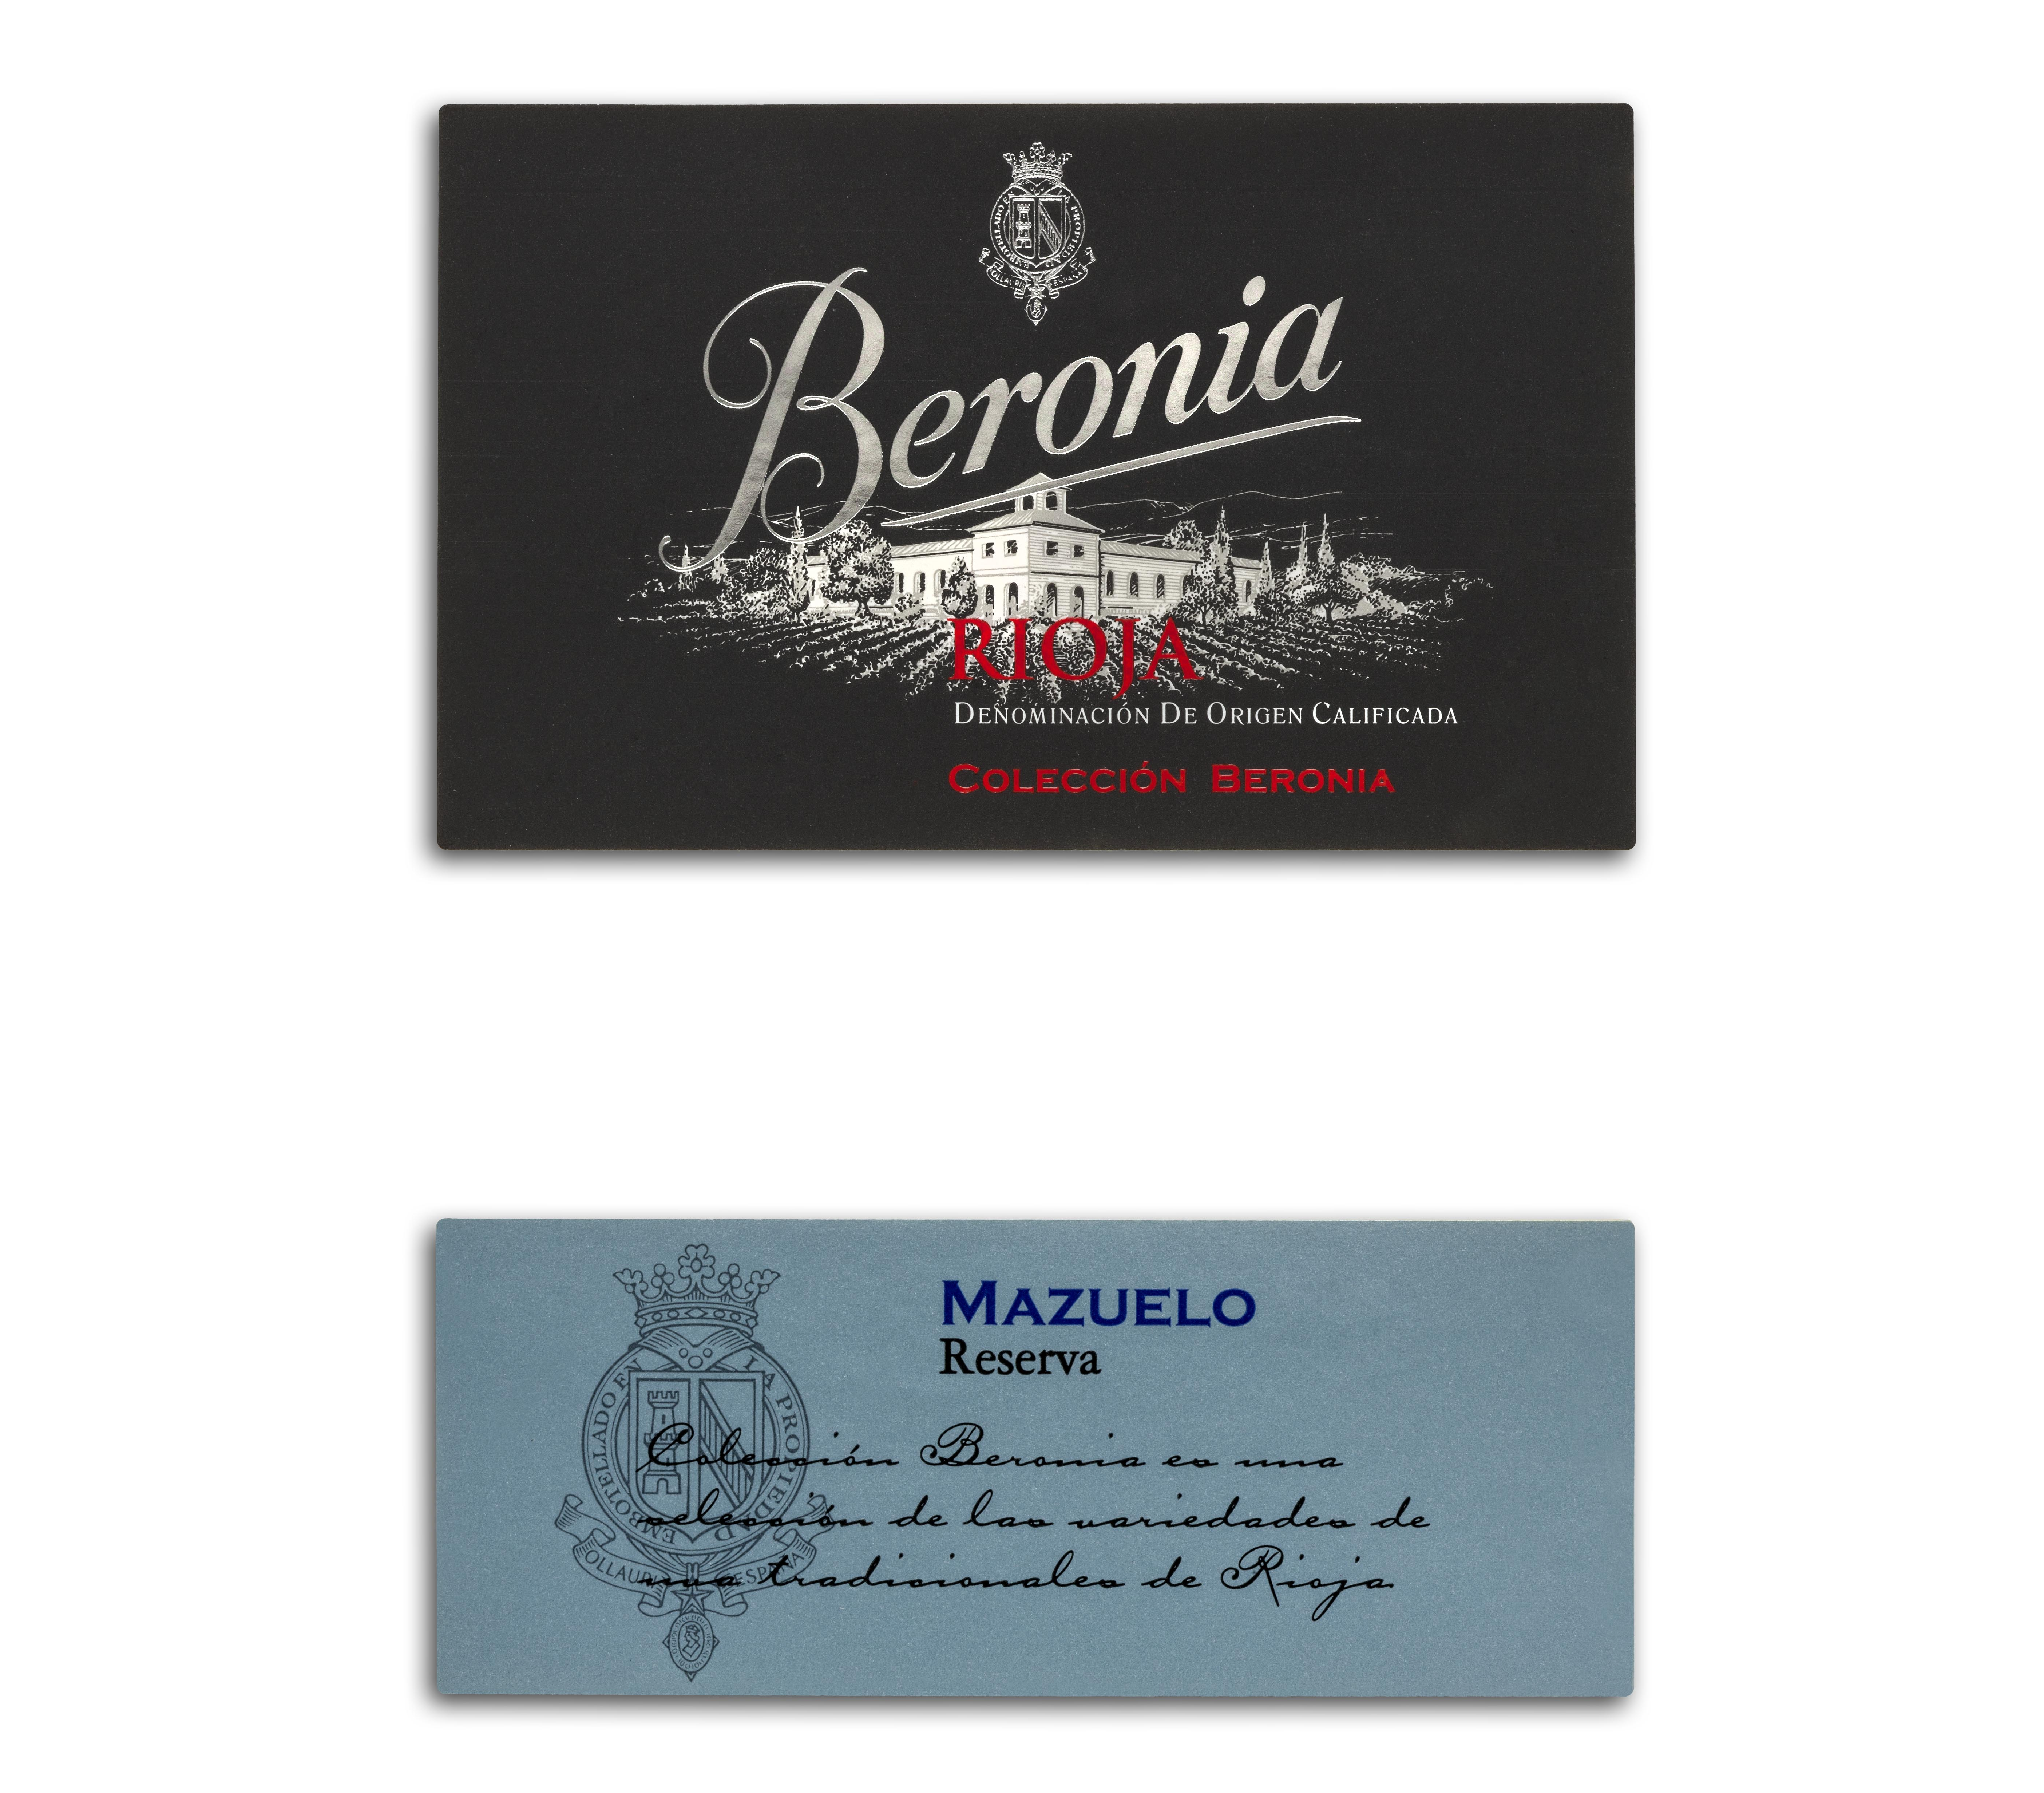 Beronia Mazuelo